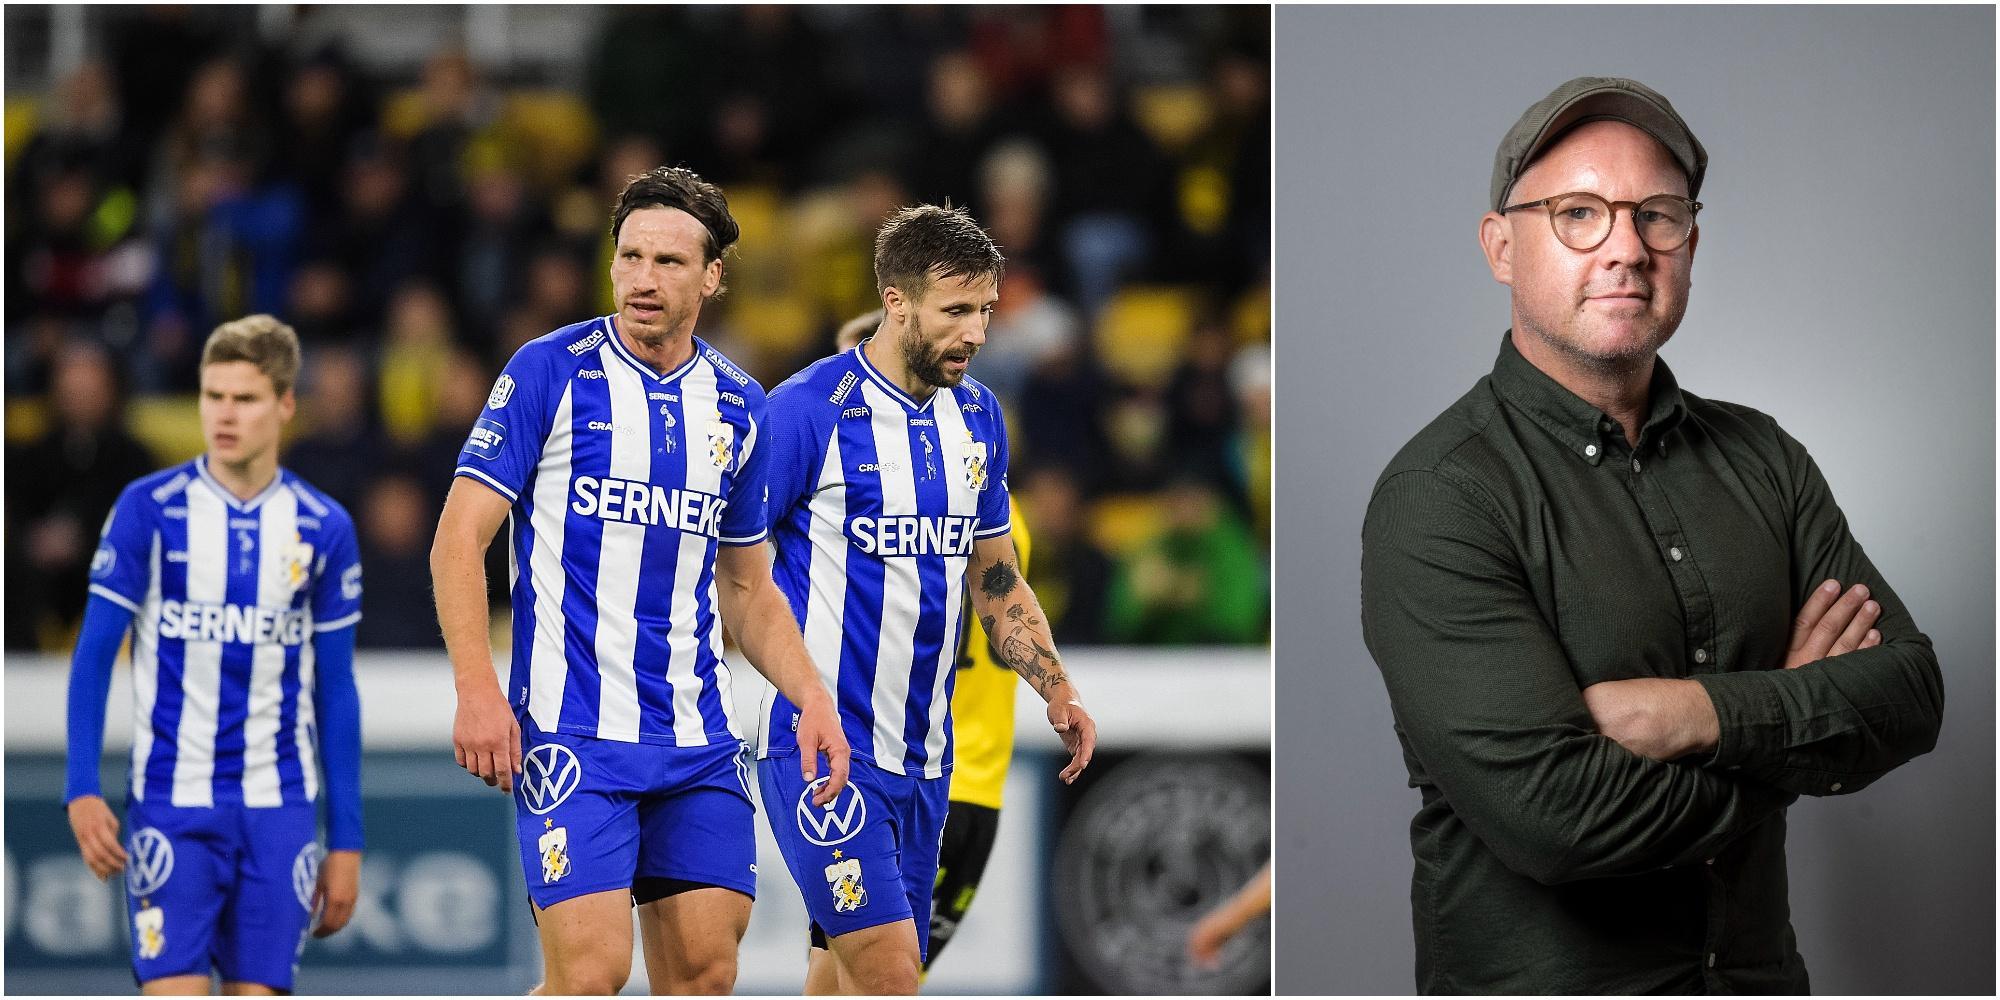 Robert Laul: Inget IFK Göteborg gör tycks hjälpa